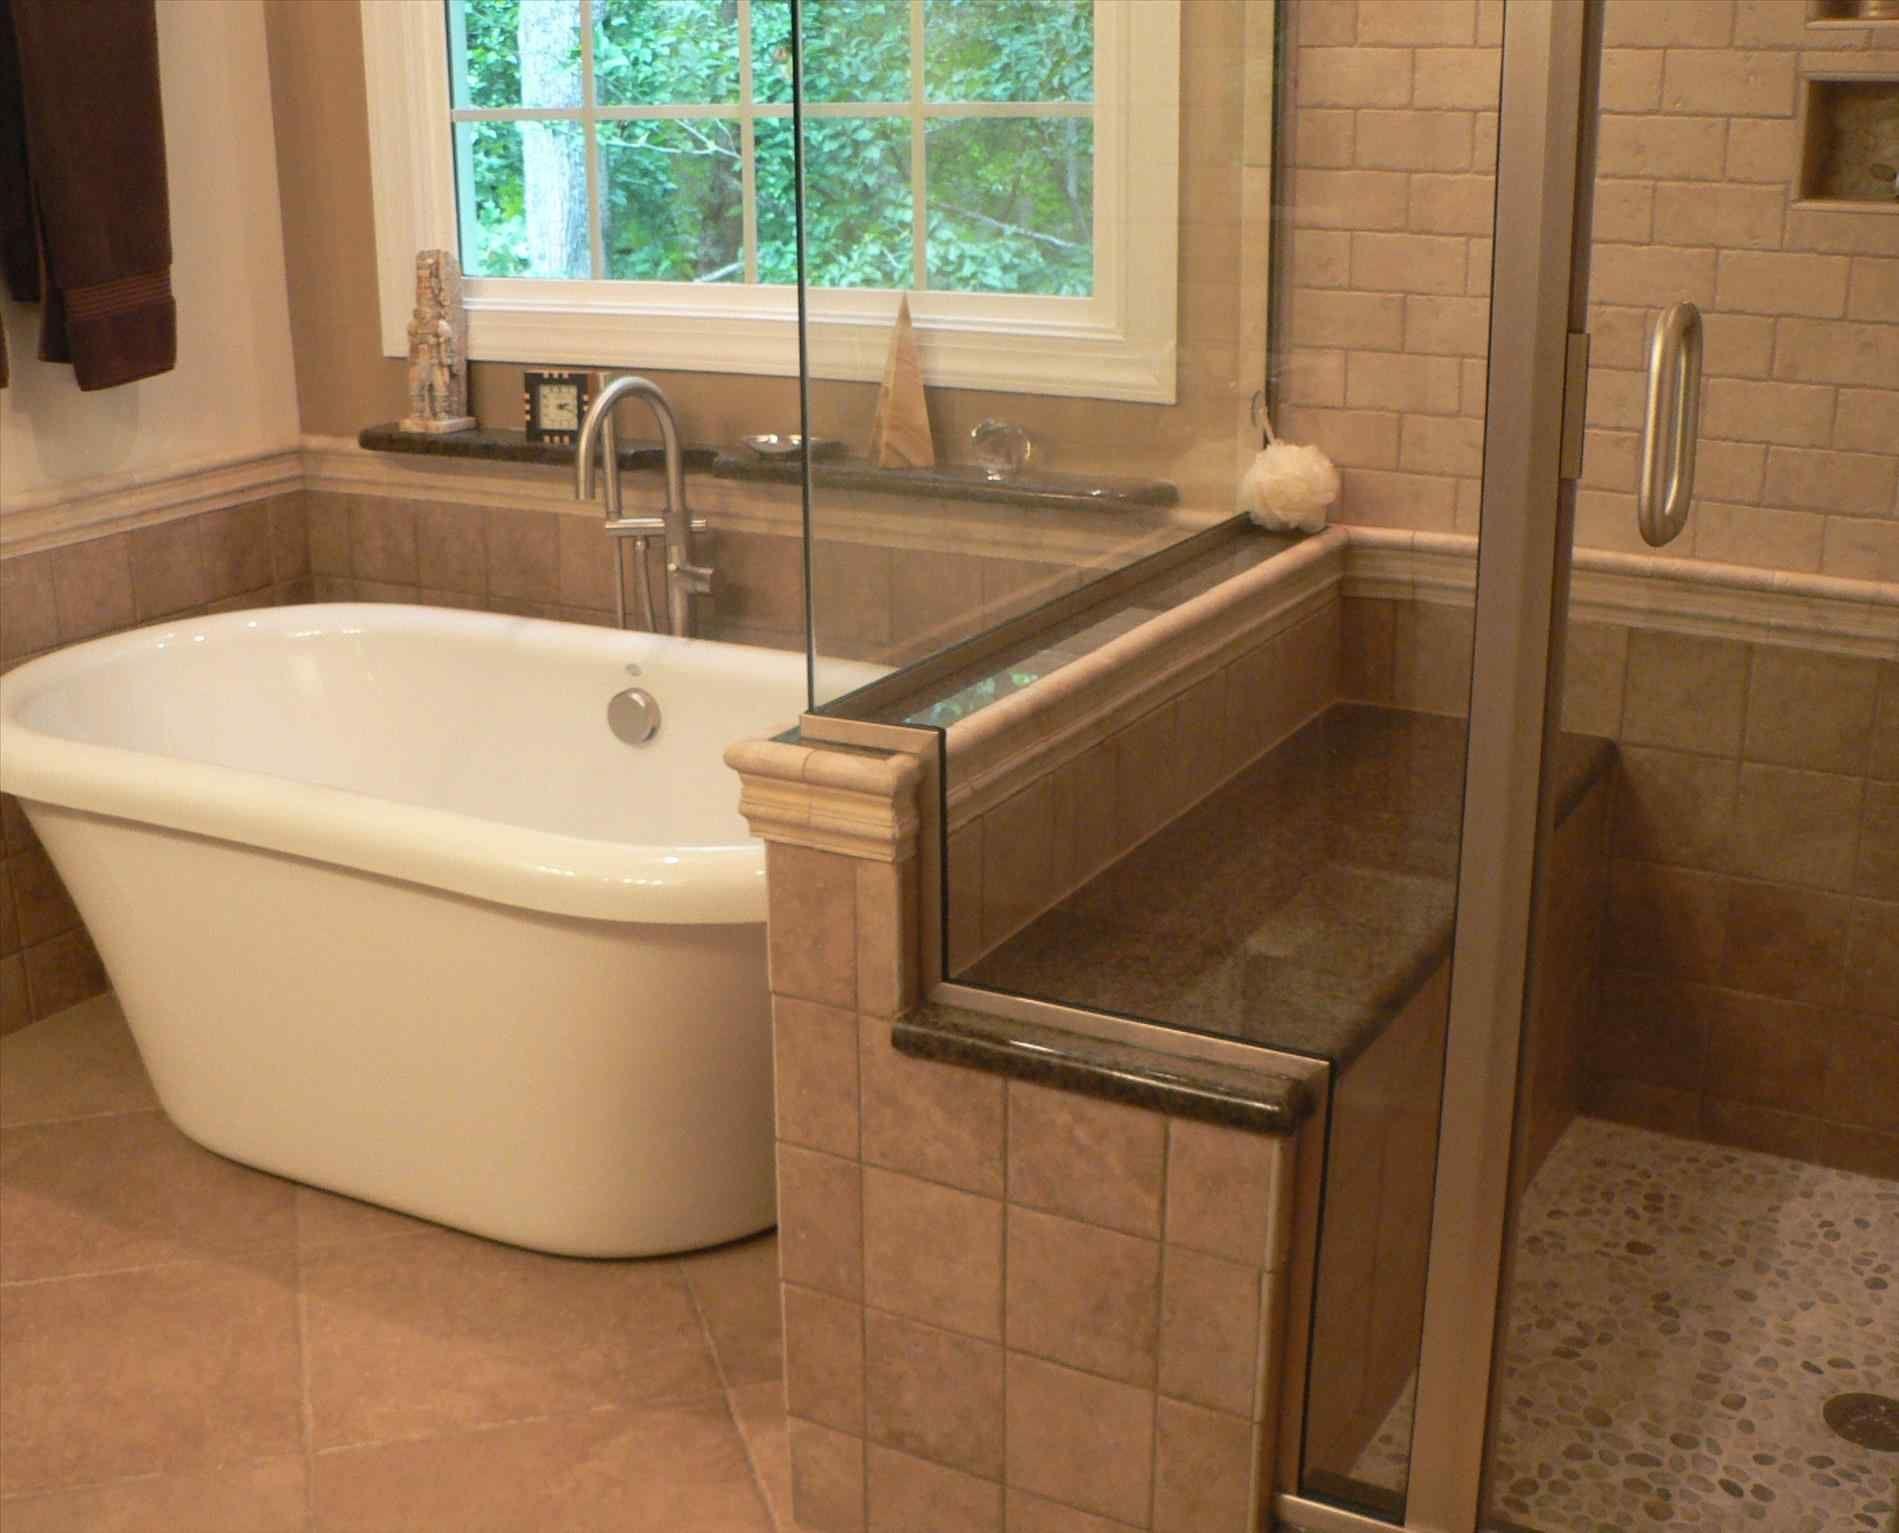 beautiful how to redo bathroom ideas-Amazing How to Redo Bathroom Pattern